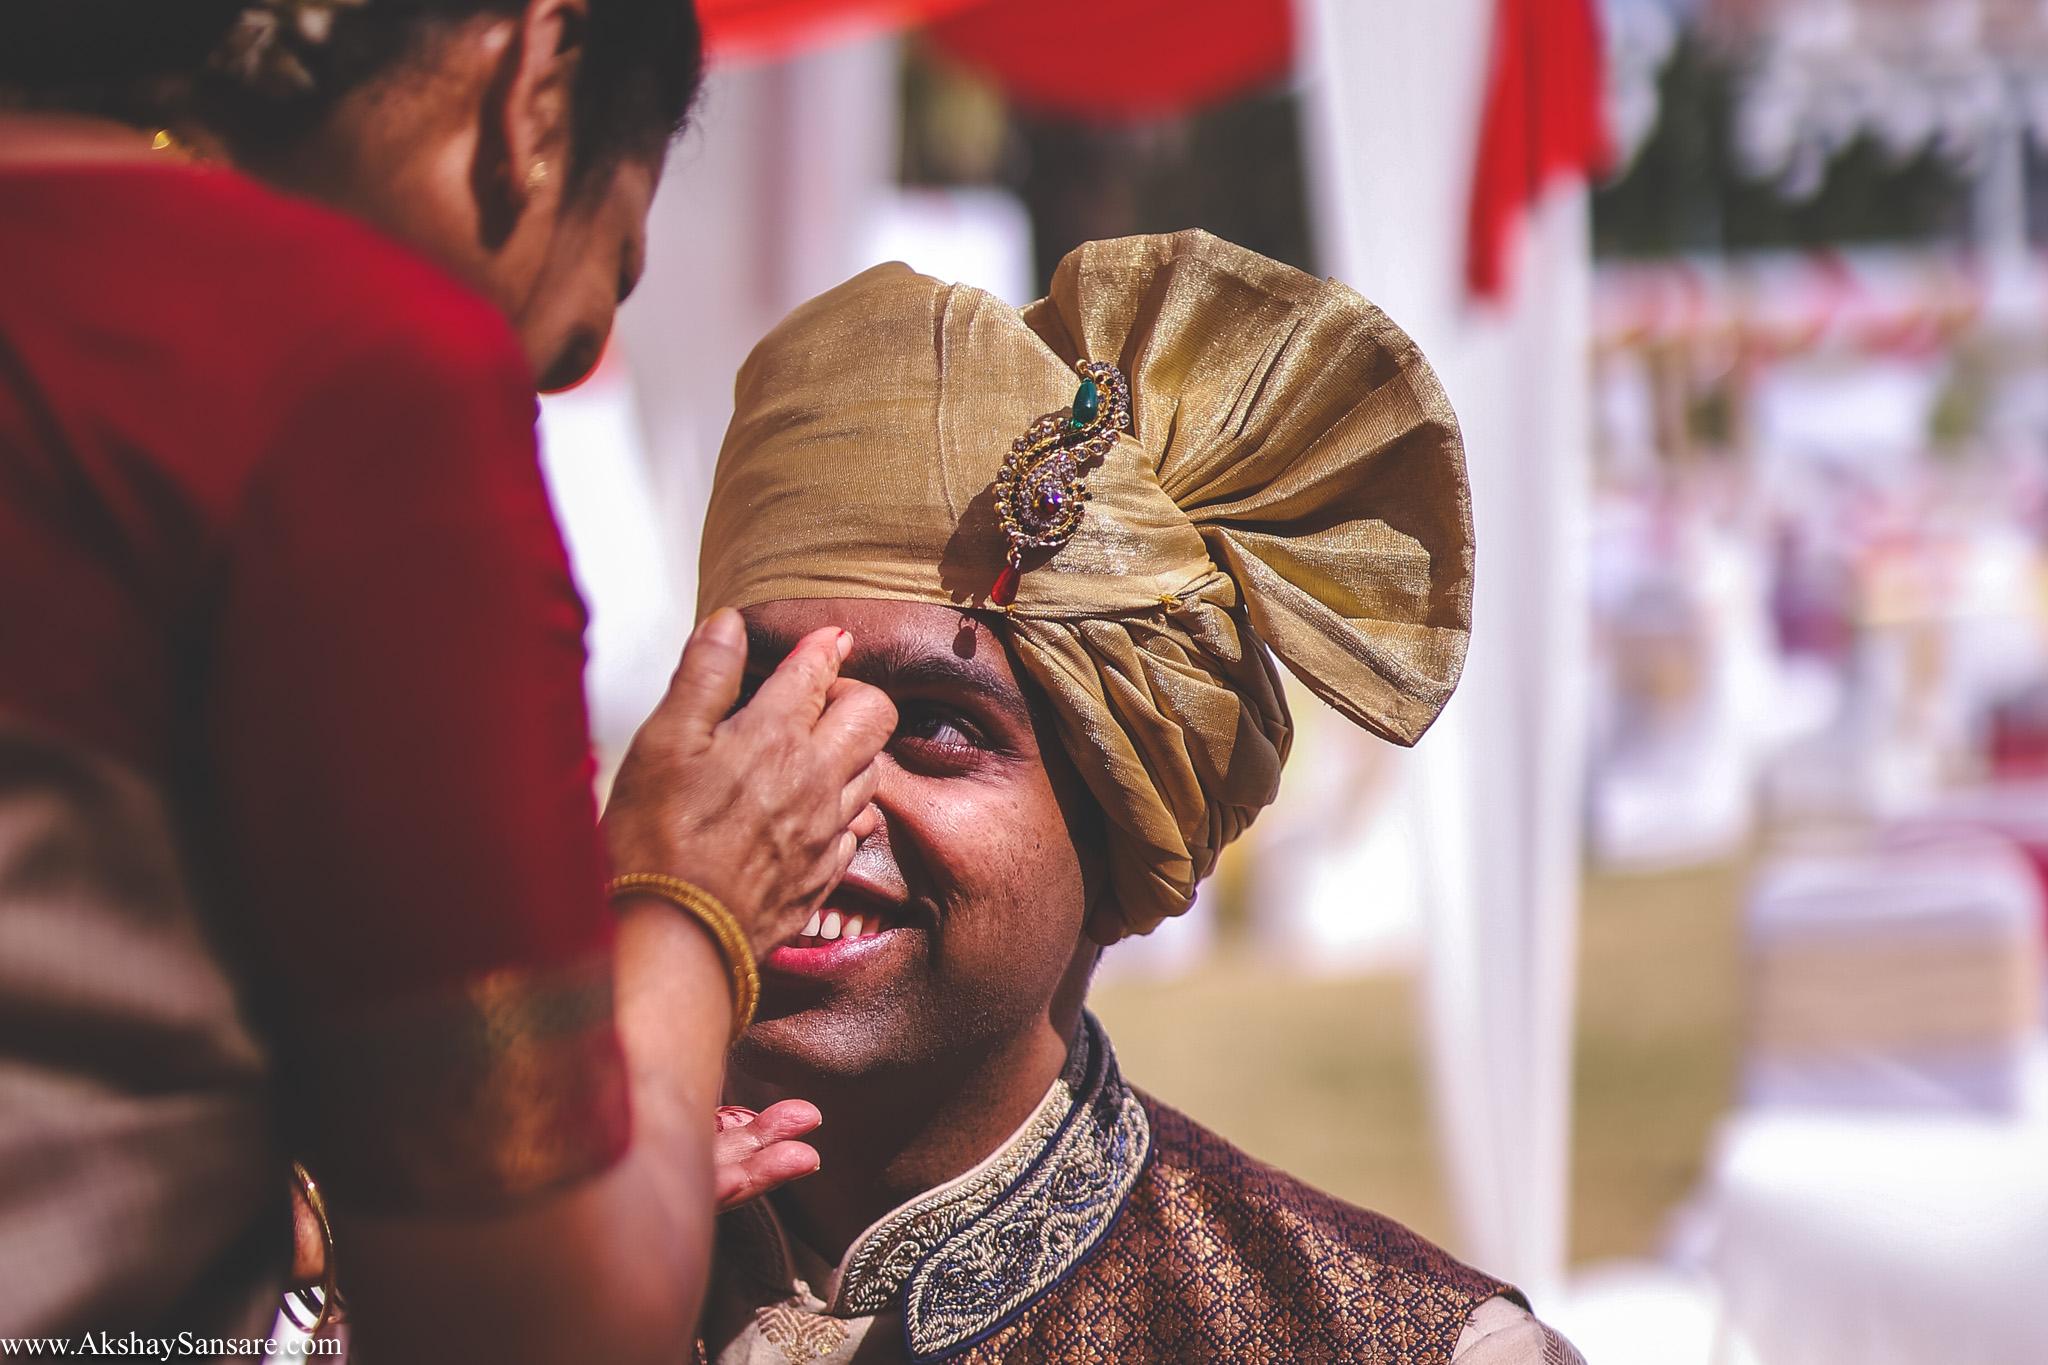 Salil x Kimaya Akshay Sansare Photography Candid wedding Photographer in mumbai best(10).jpg